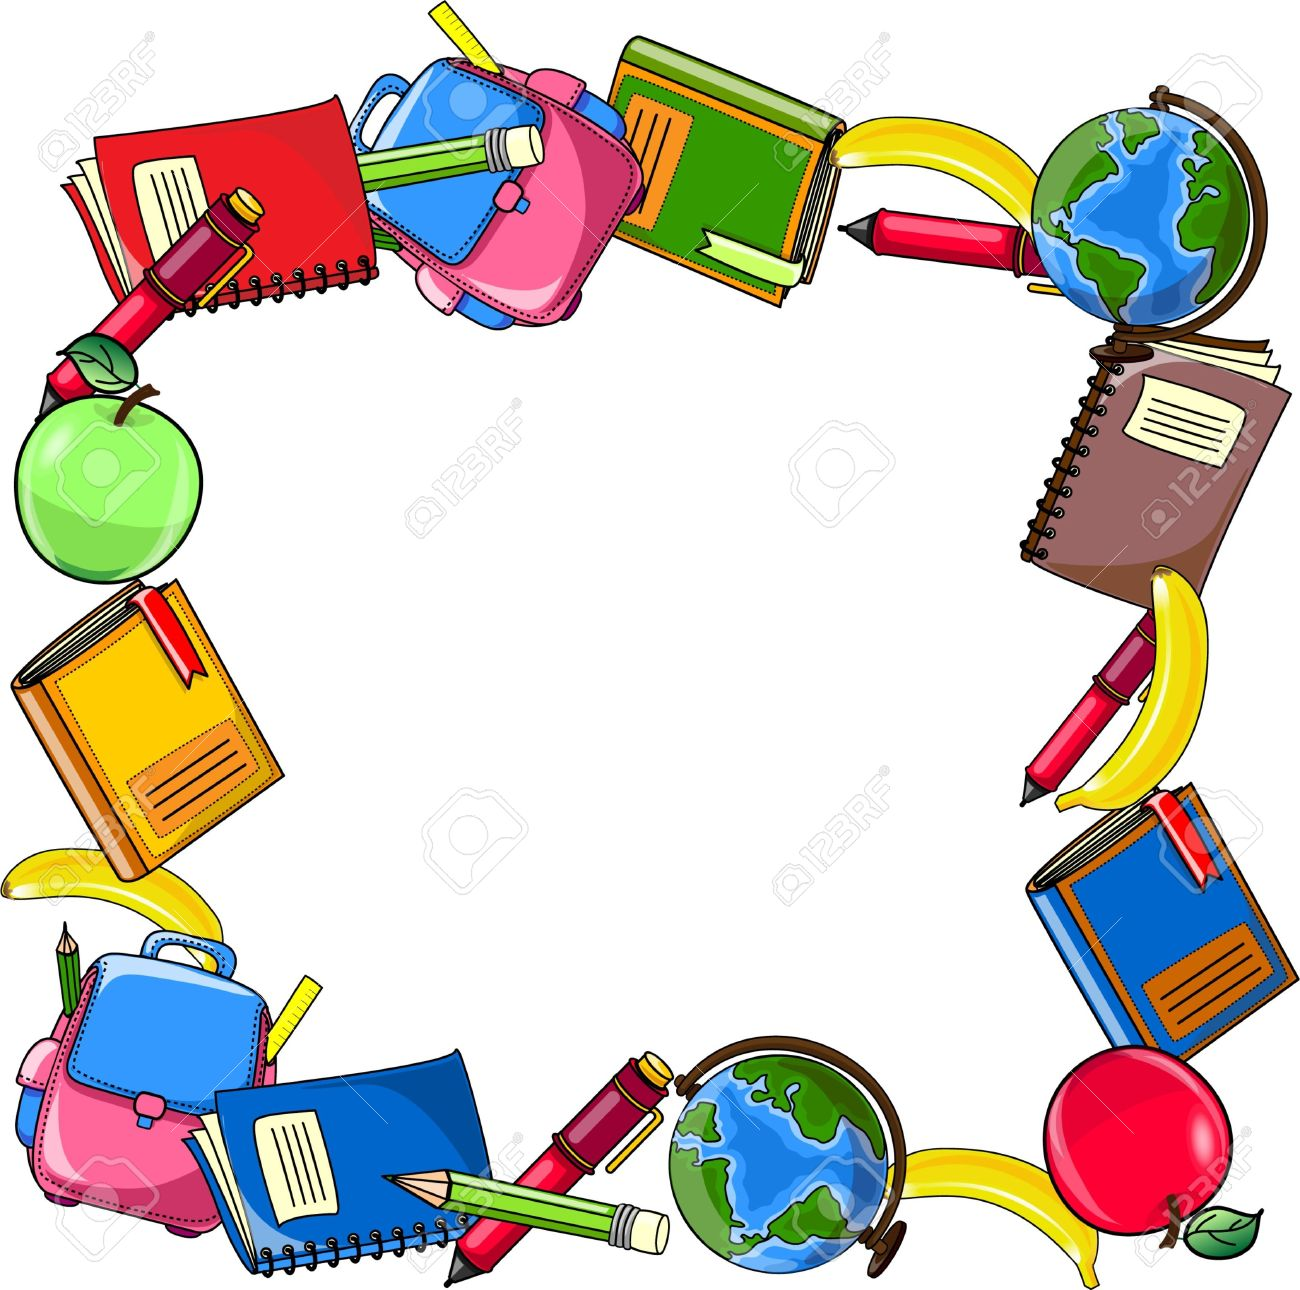 School supplies background clipart